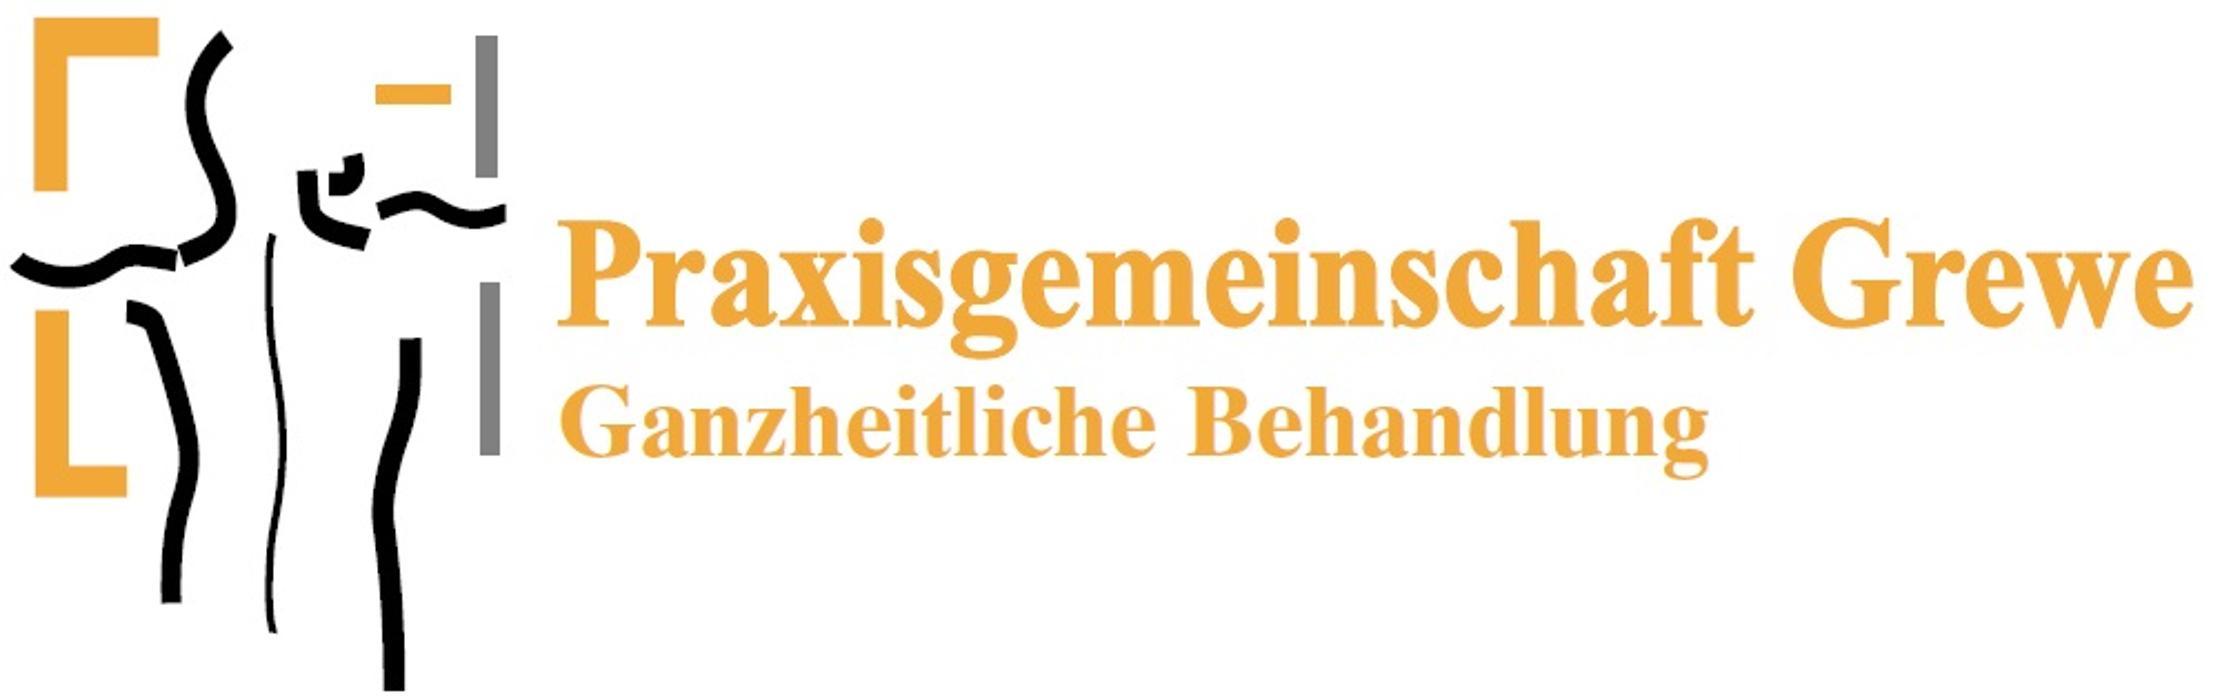 Bild zu Praxisgemeinschaft Grewe - Sabine Grewe + Ernet Grewe in Balge